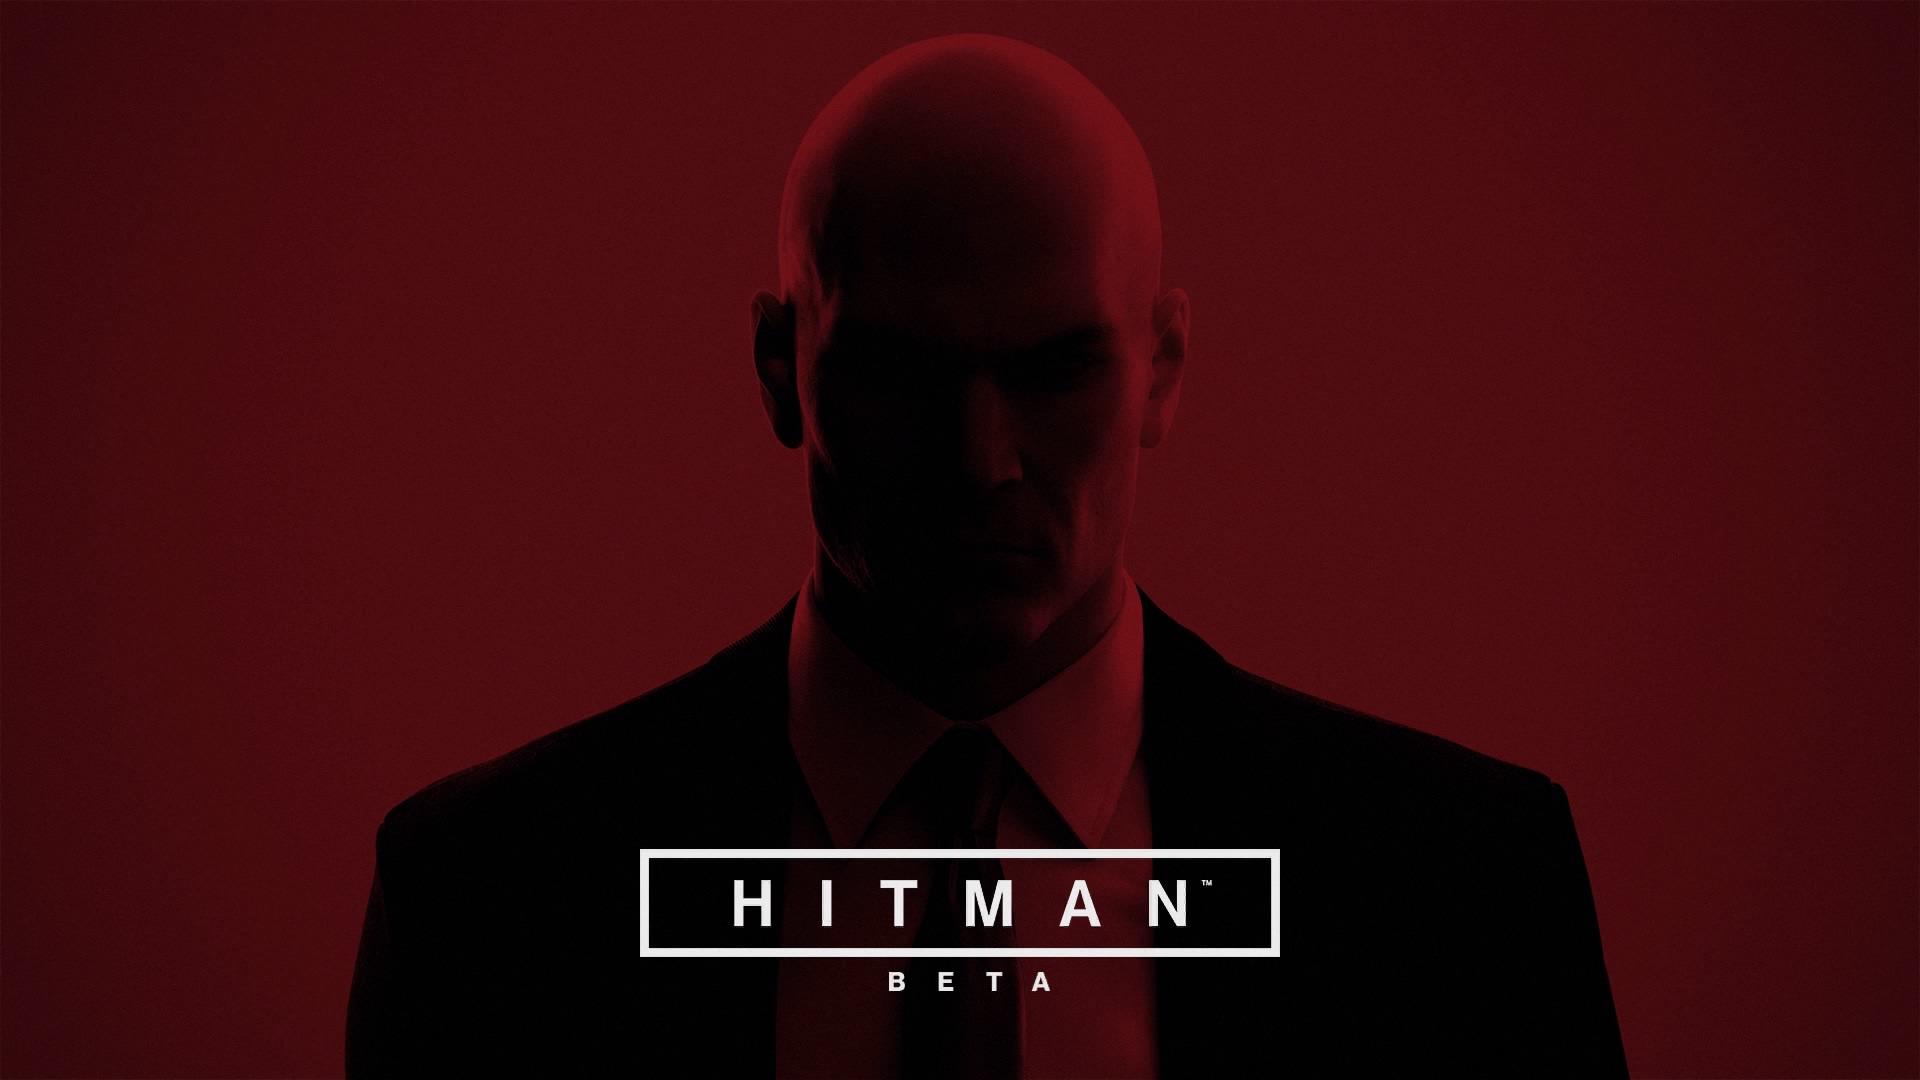 HITMAN_TM_-_Beta_20160213091953.jpg